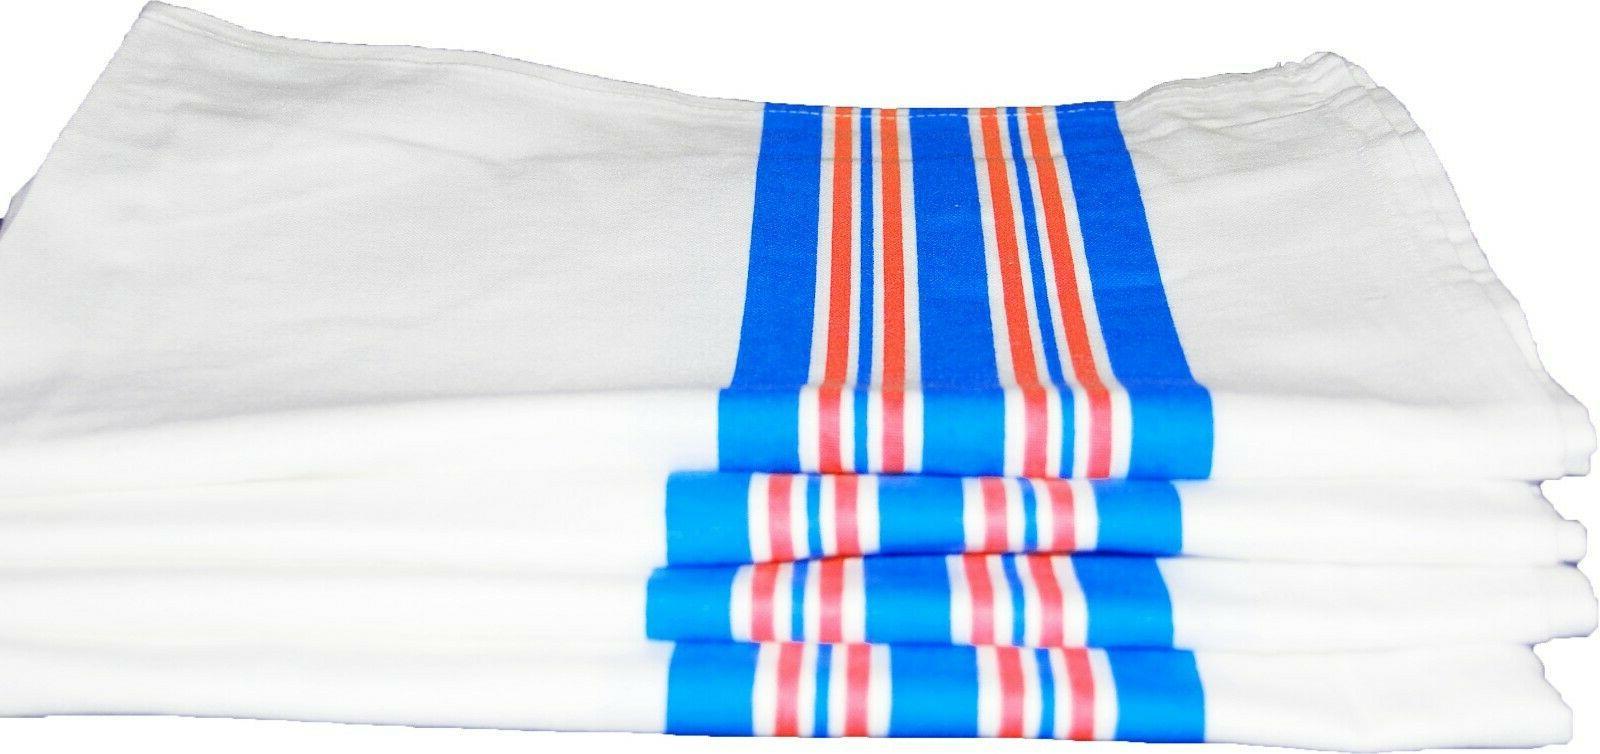 12 NEW Infant Blankets